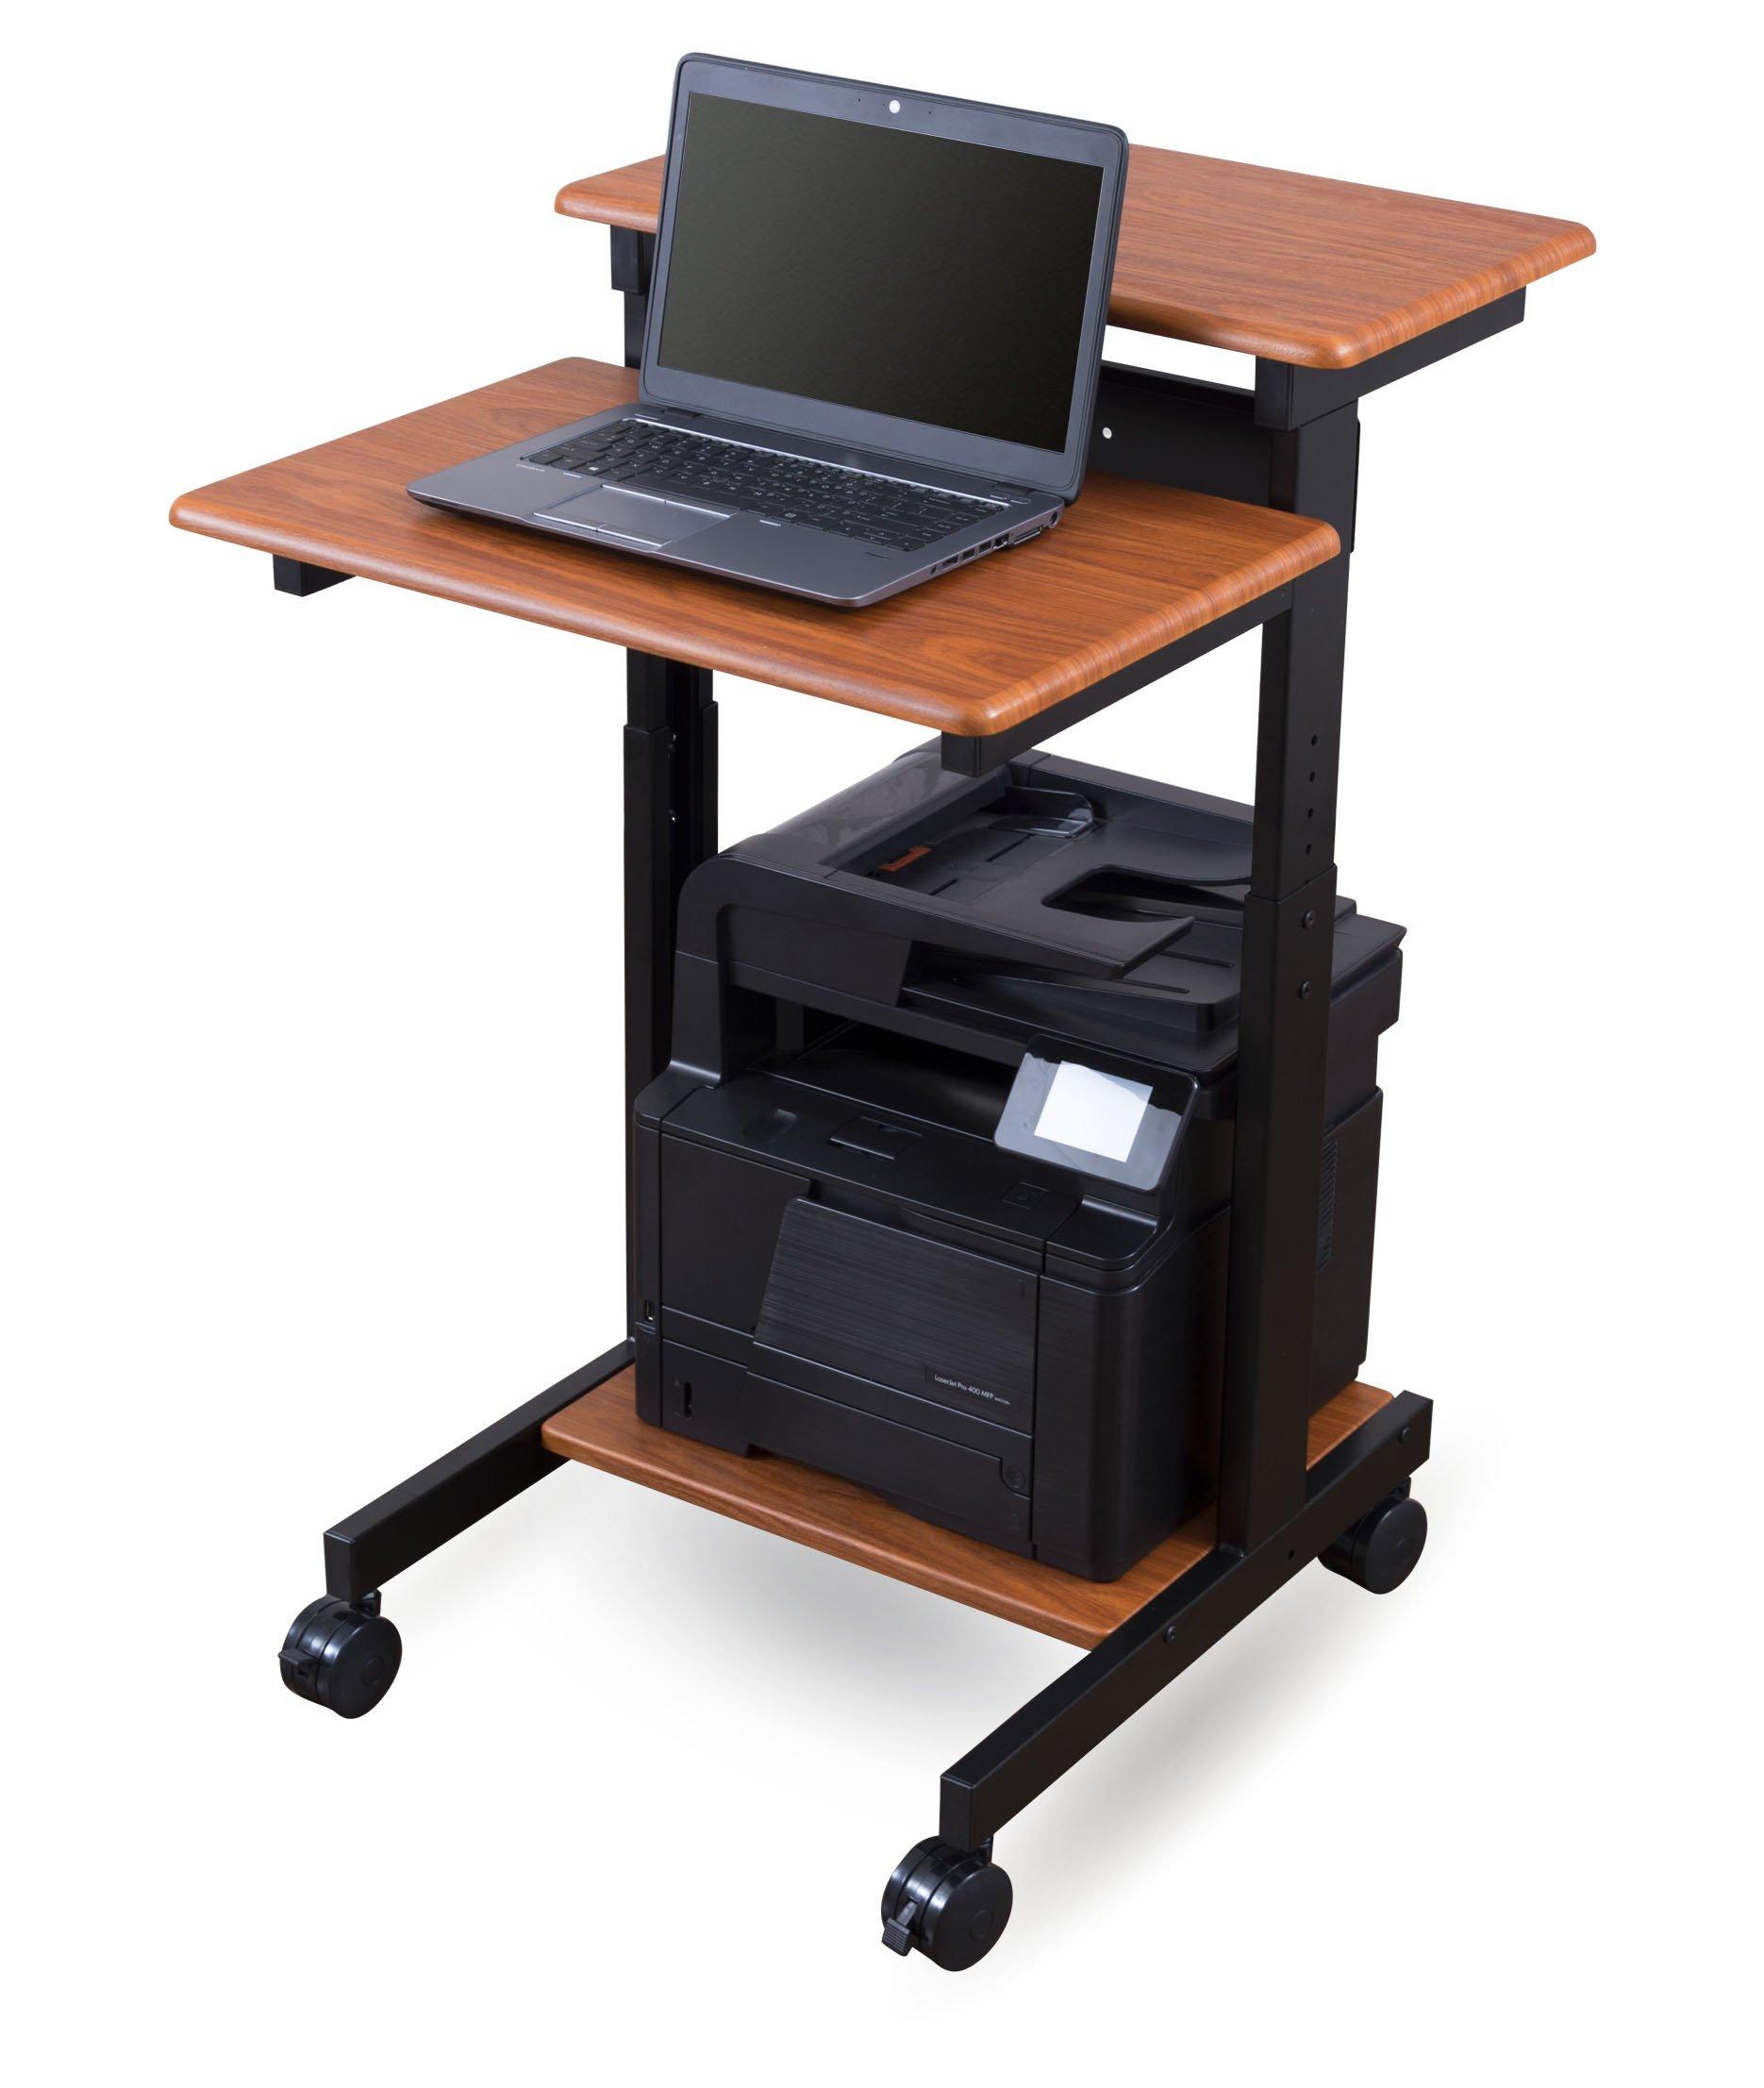 Mobile Ergonomic Stand up Desk Computer Workstation (24'', Teak) by Stand Up Desk Store